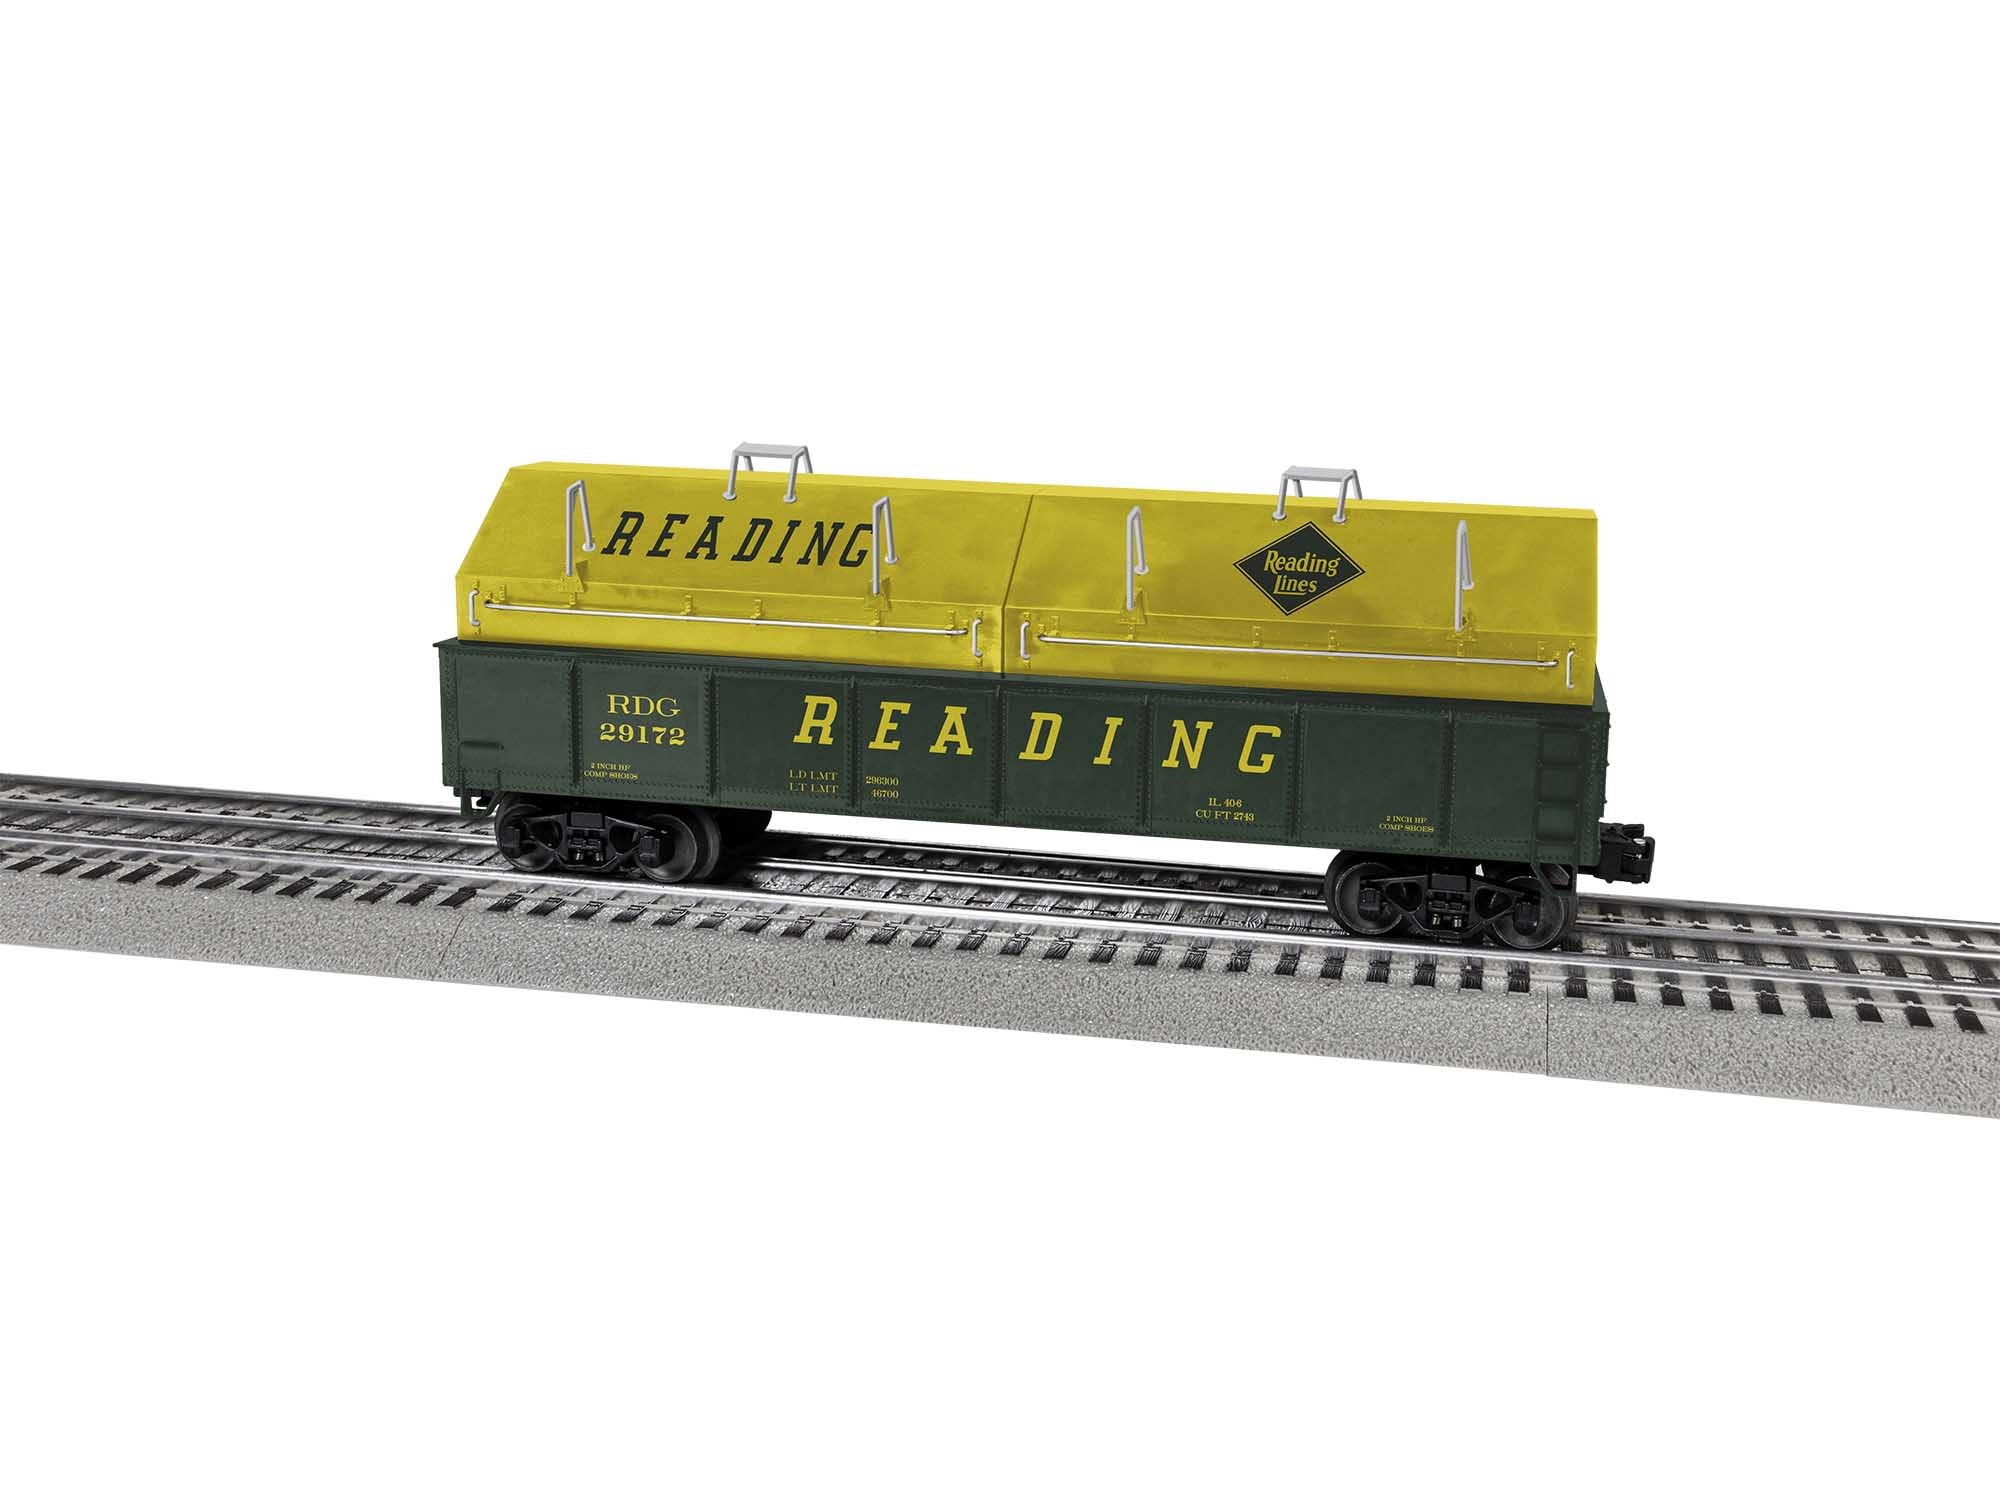 Lionel 2043164 O Gondola Reading RDG #29172